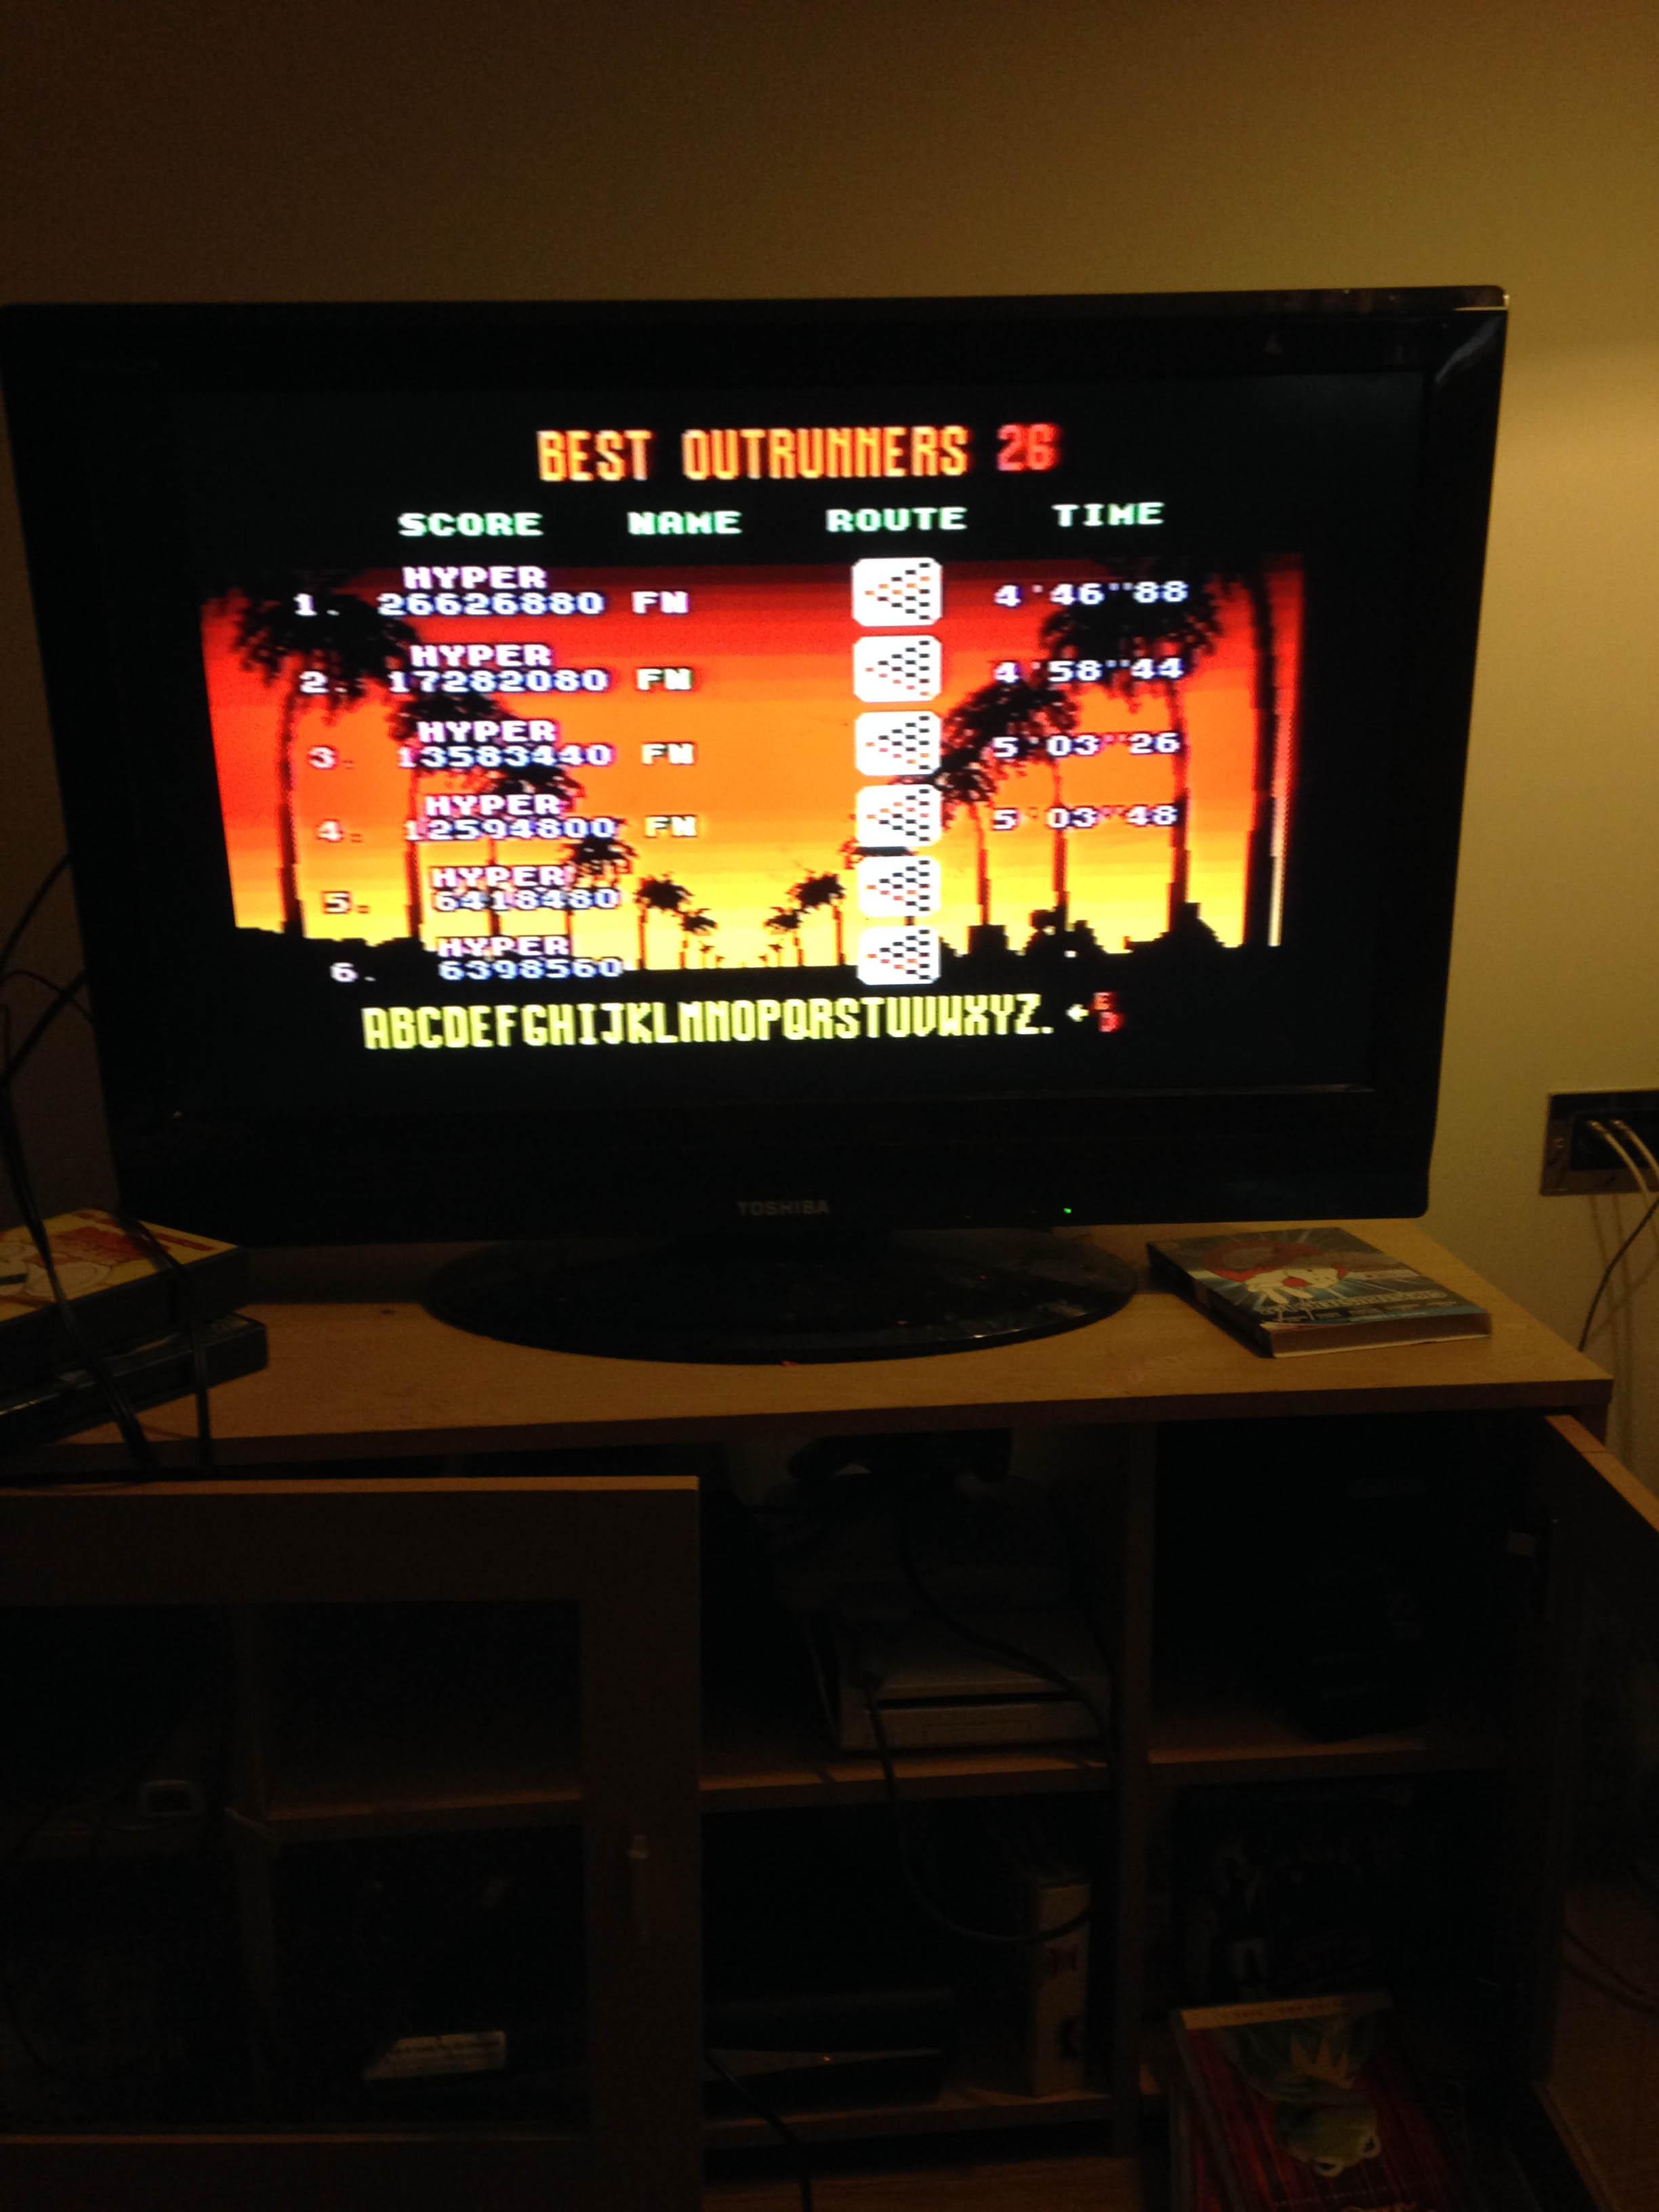 mechafatnick: Outrun [Hyper] Goal D (Sega Genesis / MegaDrive) 13,583,440 points on 2015-03-07 02:40:31